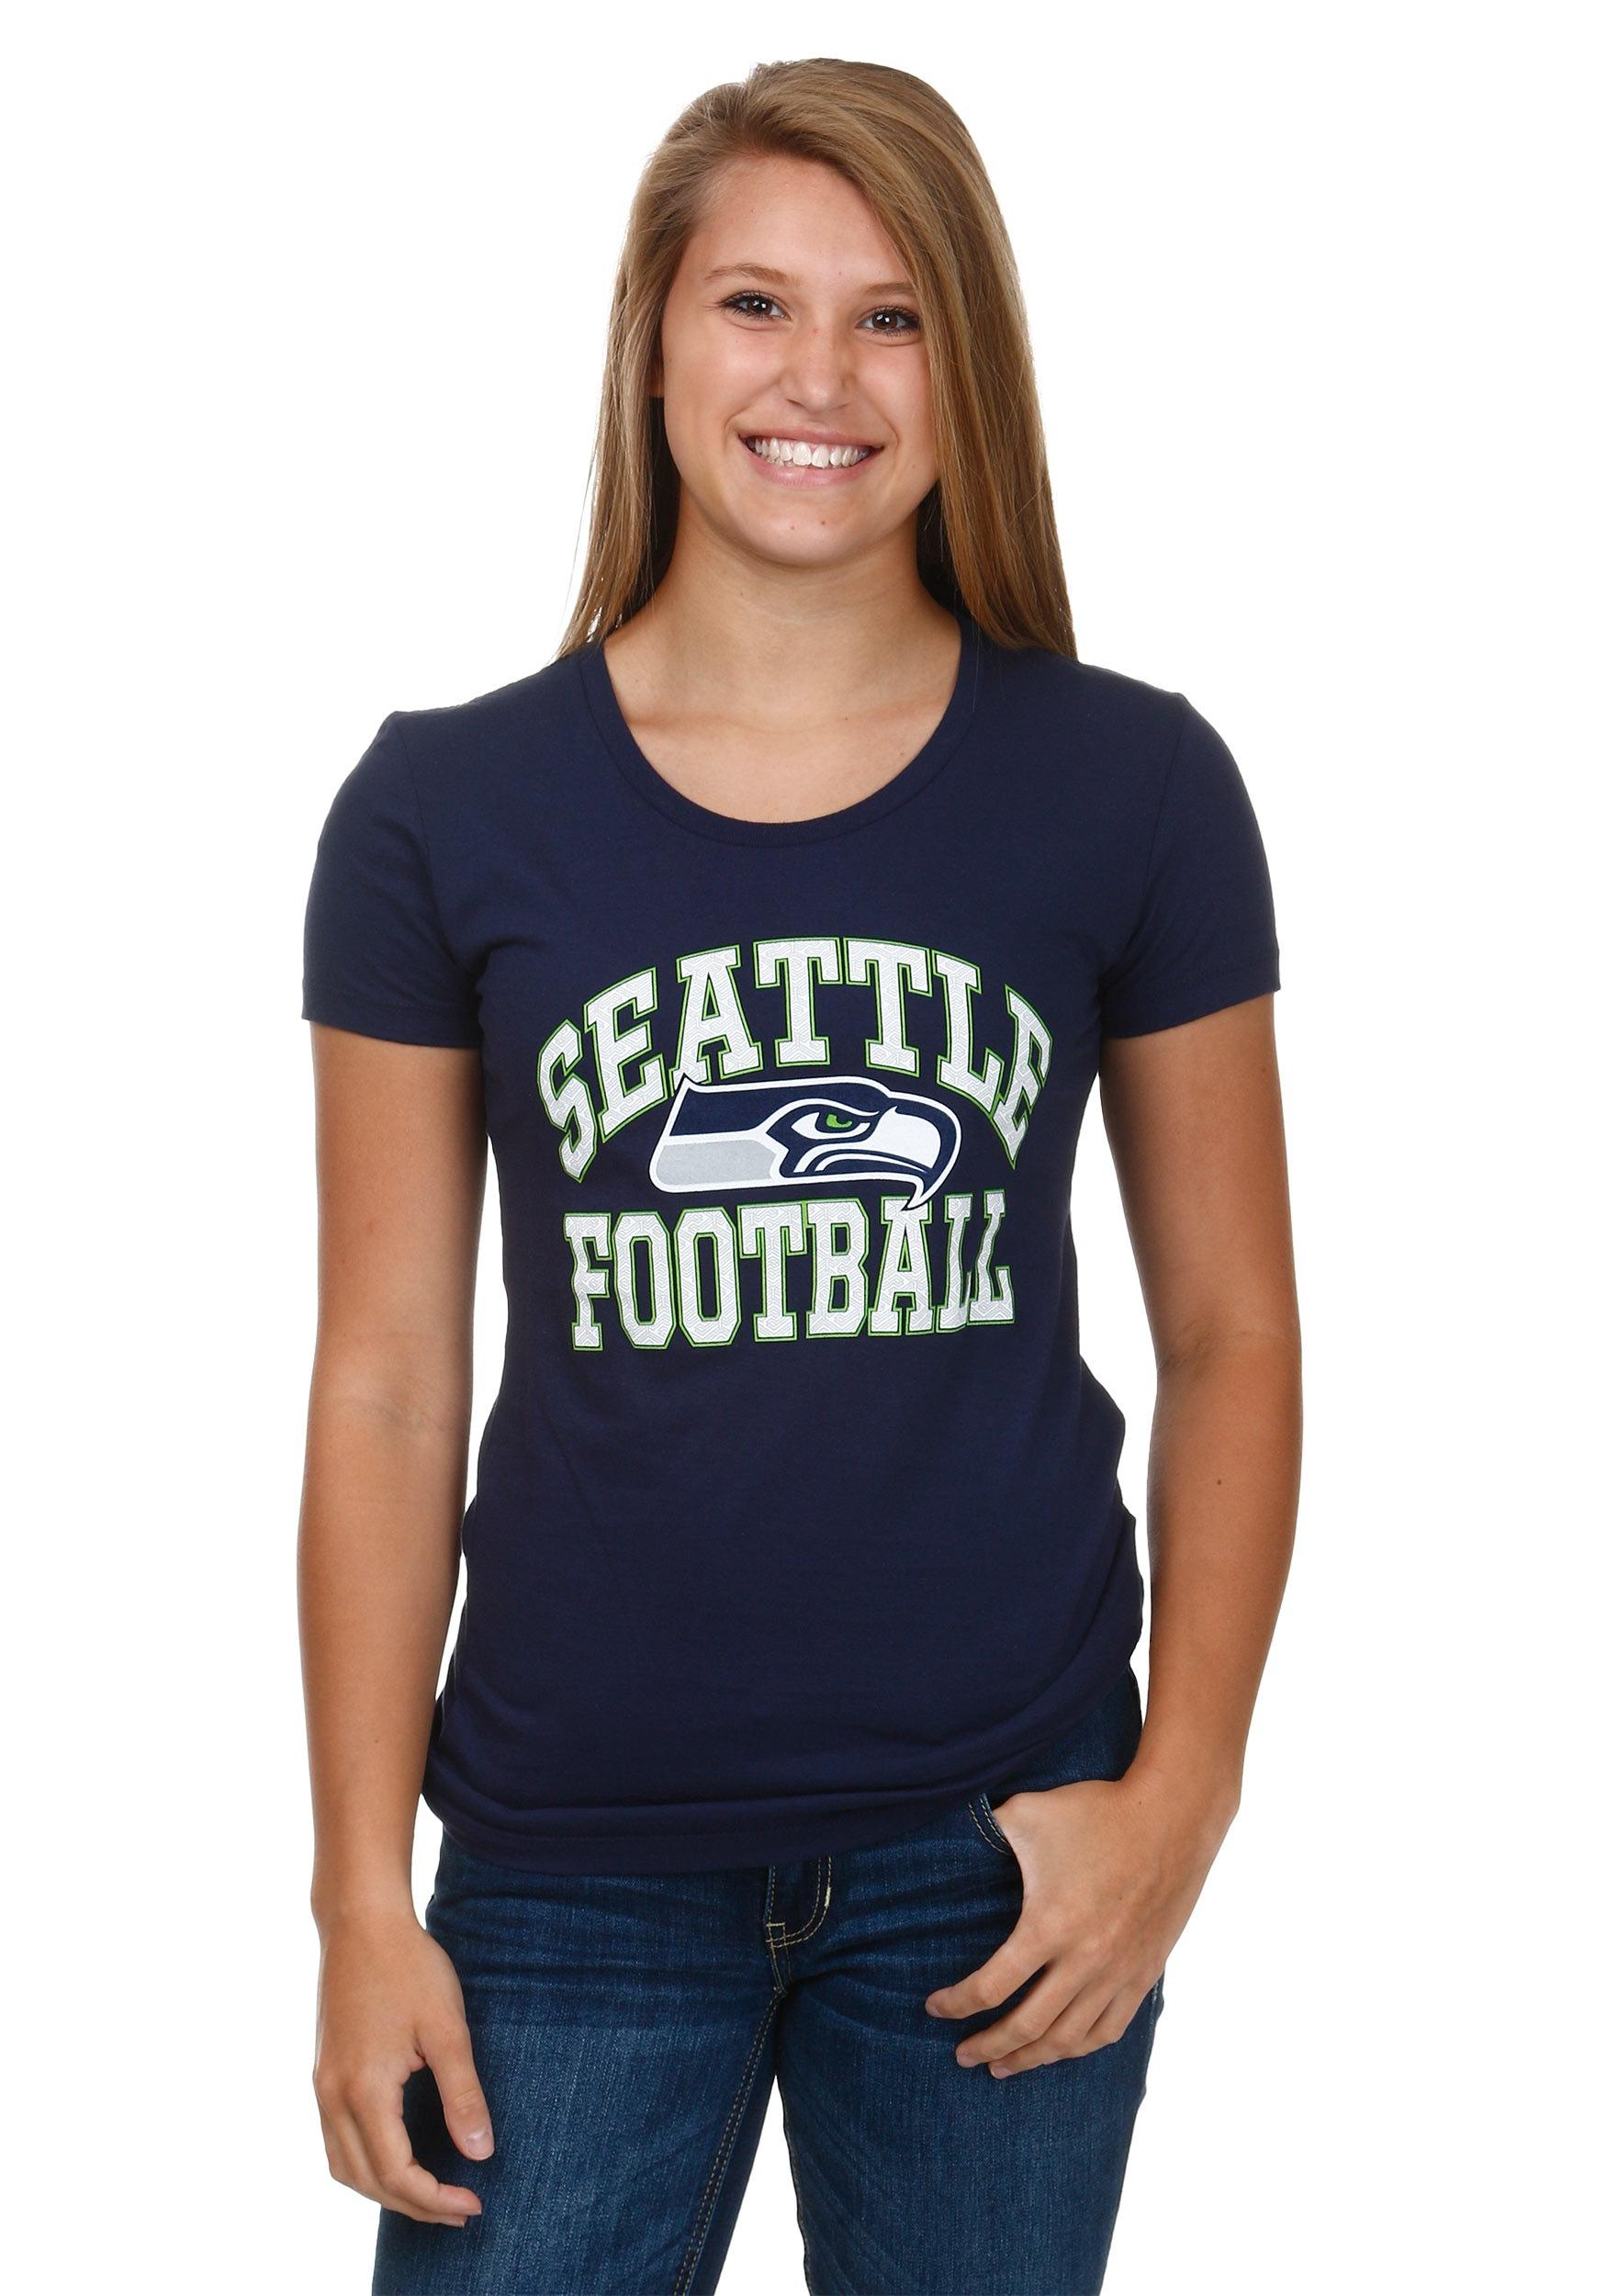 Seattle Seahawks Shirt Womens